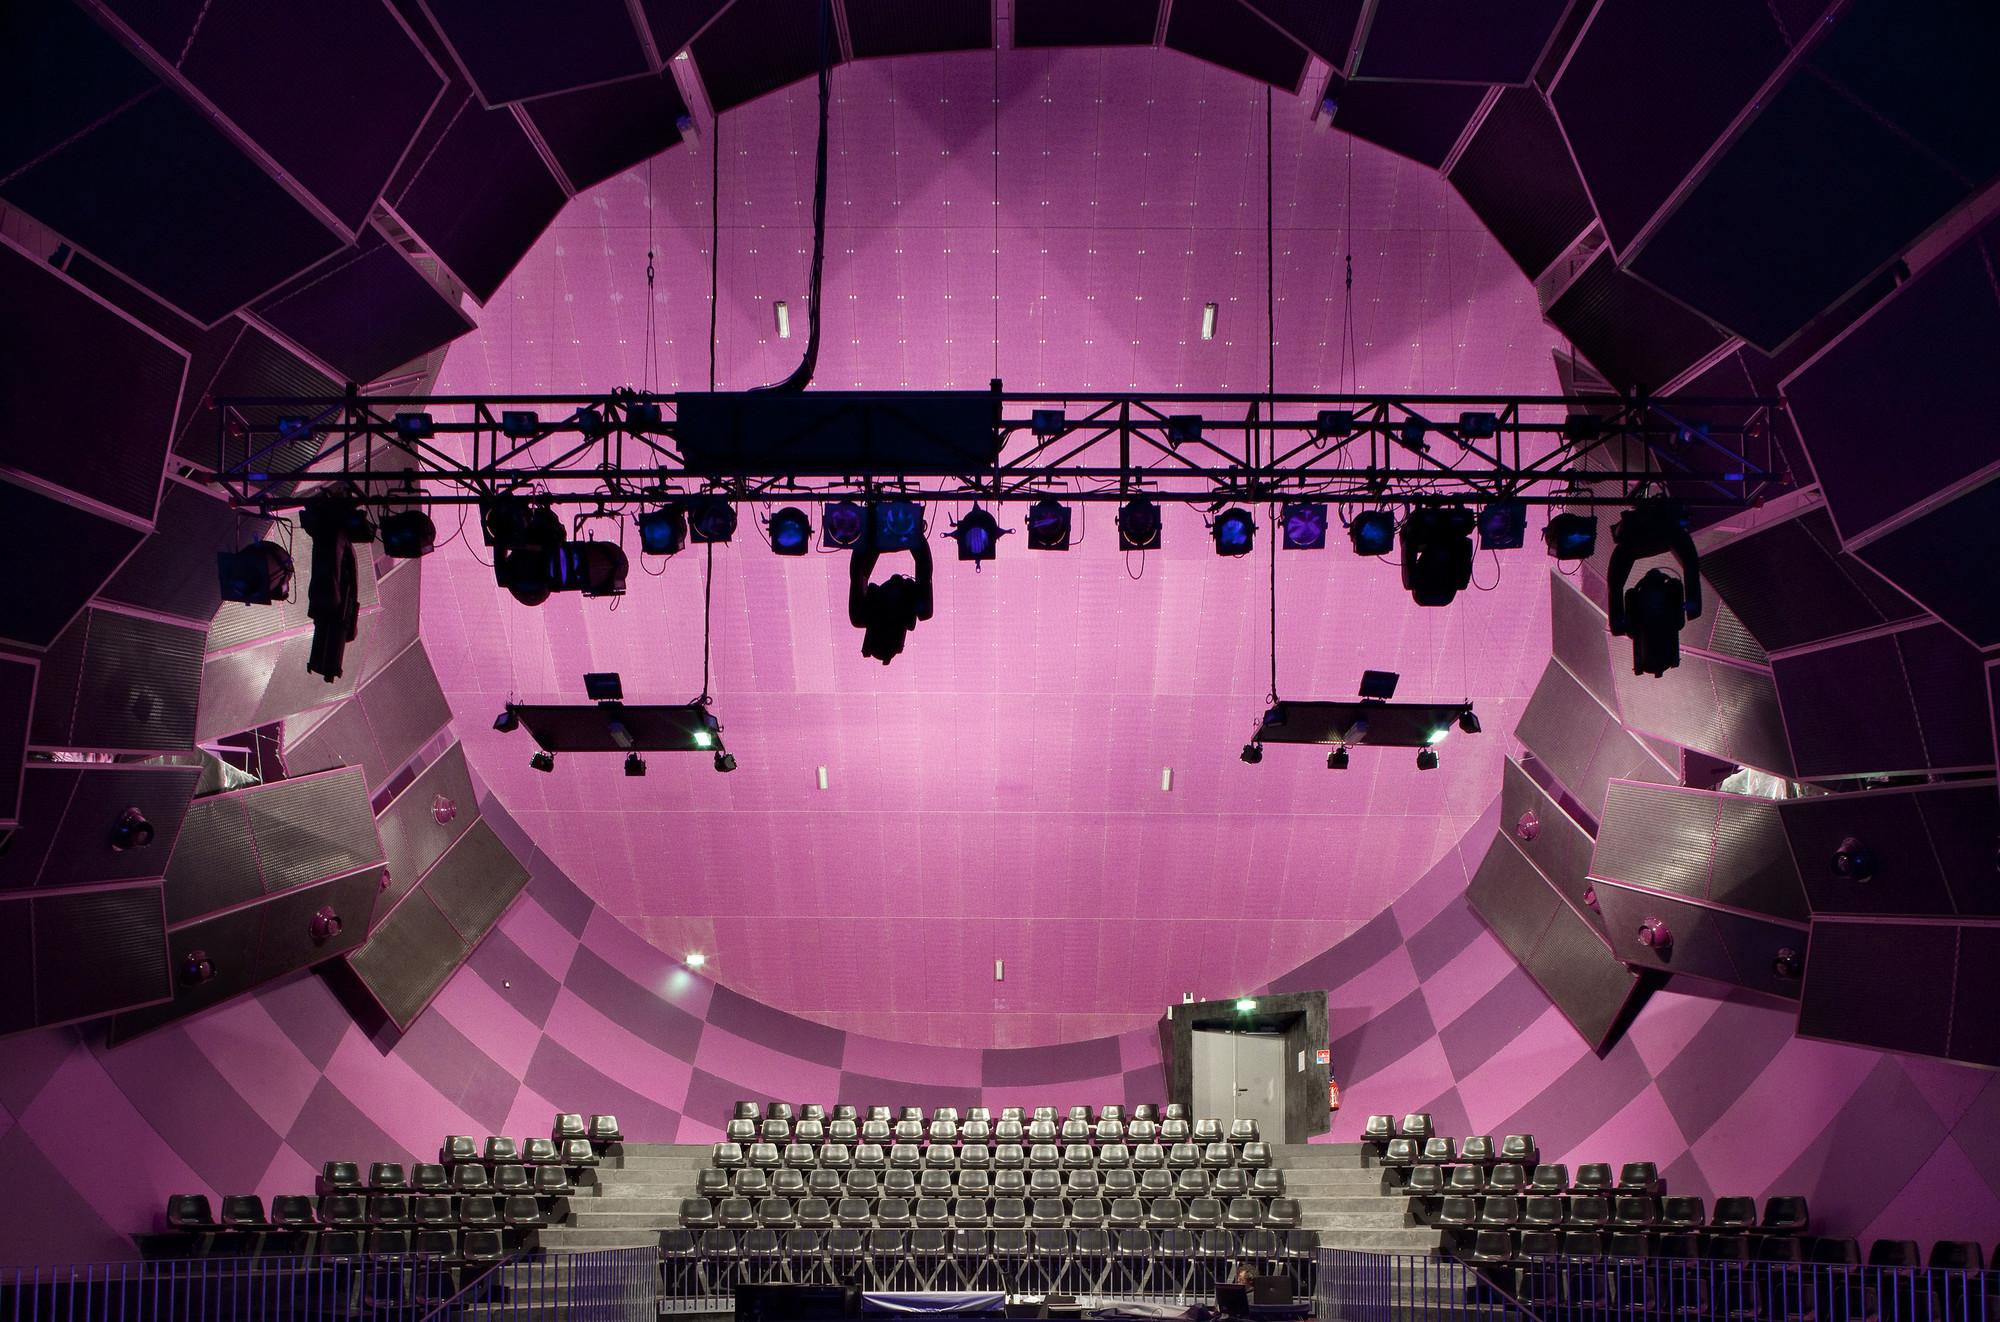 Gallery Of La Luciole Concert Hall Moussafir Architectes Associ 233 S 8